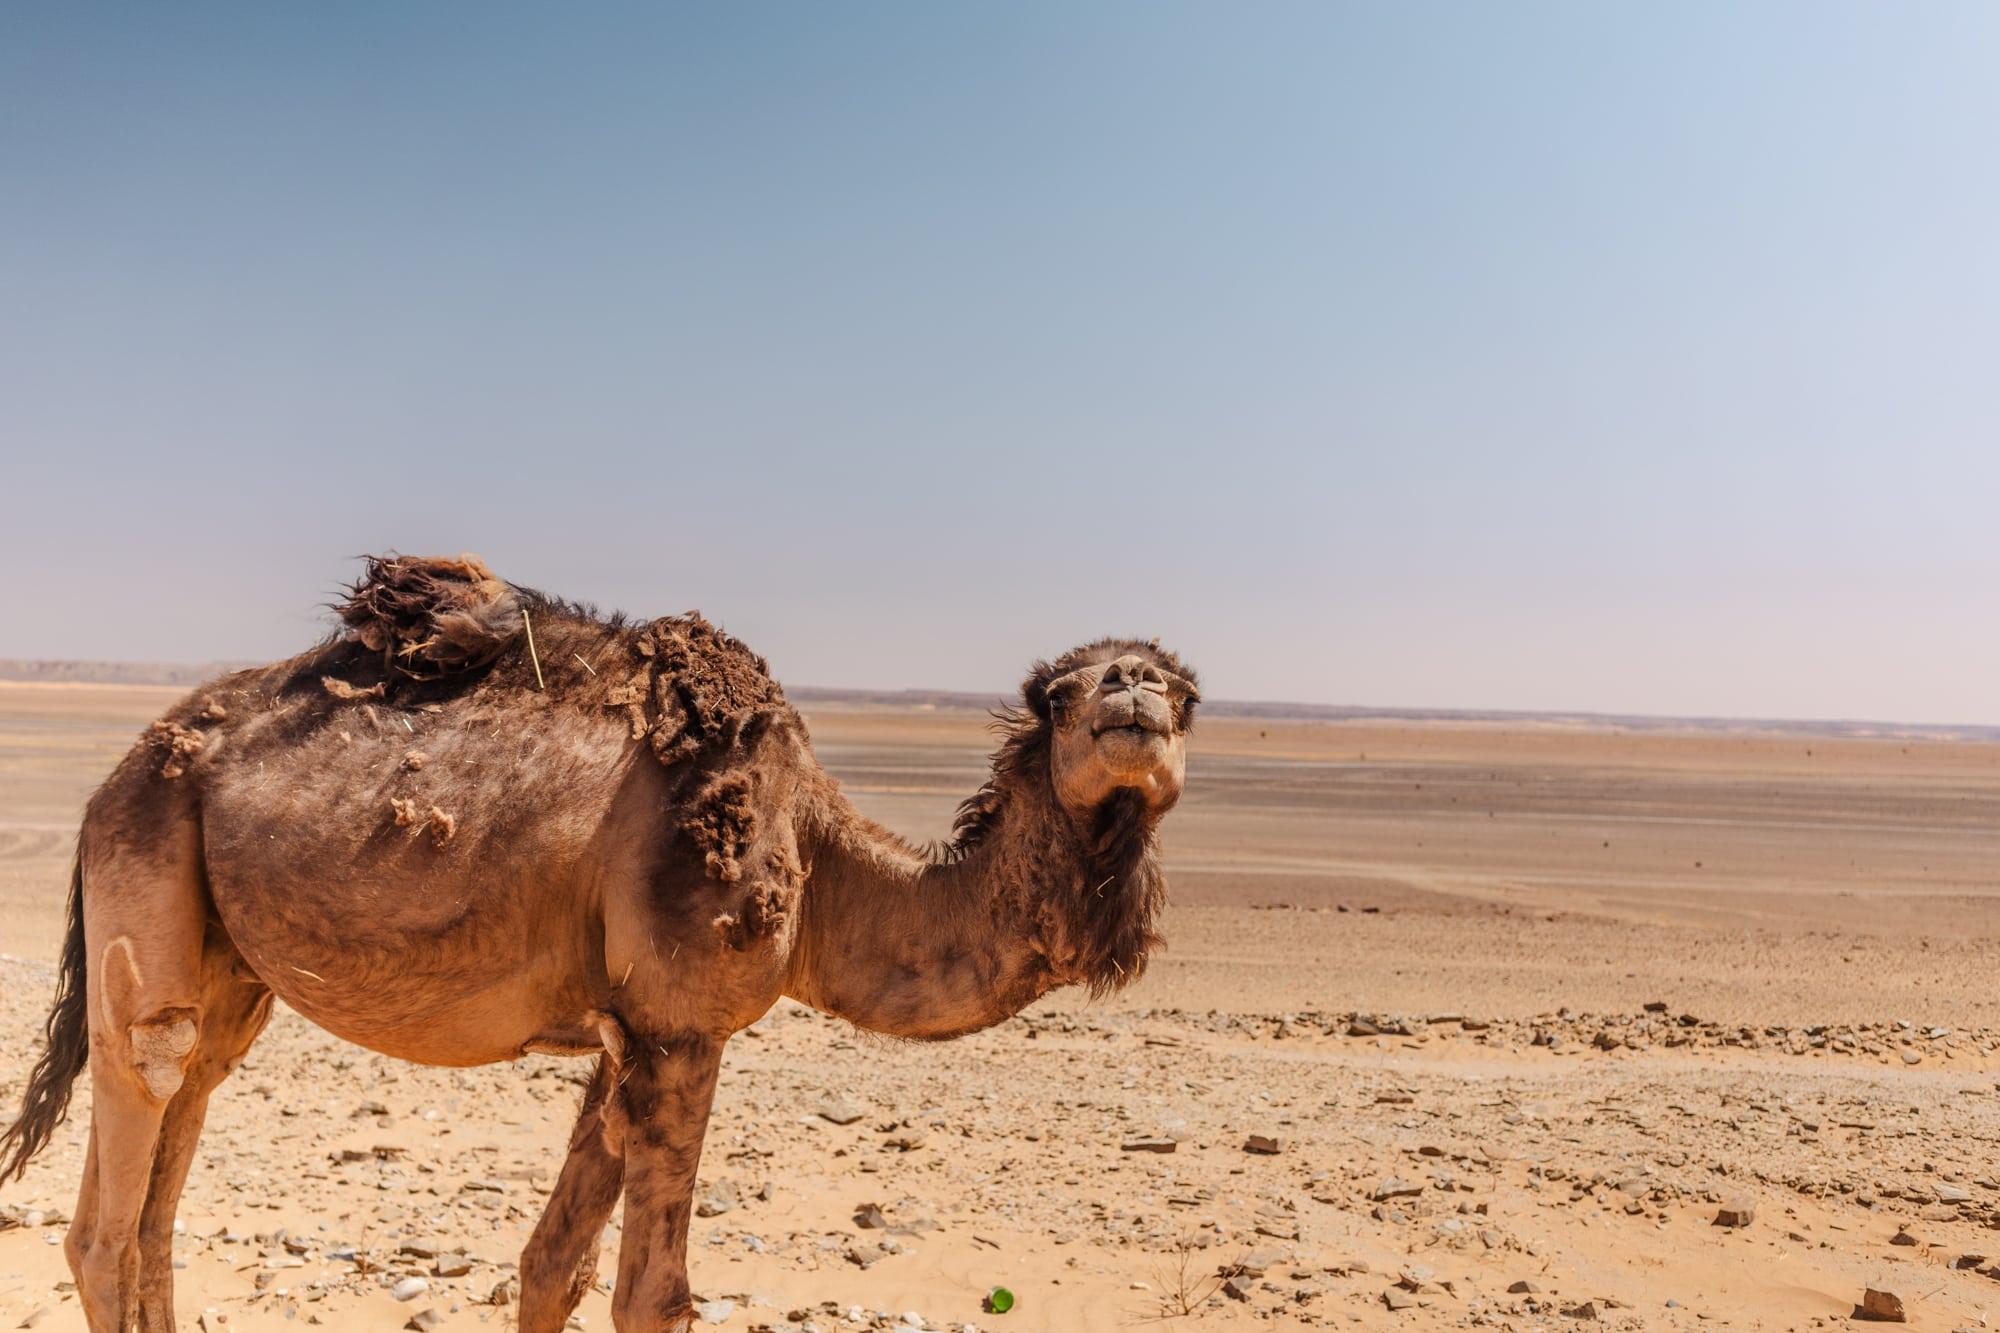 Morocco-camel-sahara-desert